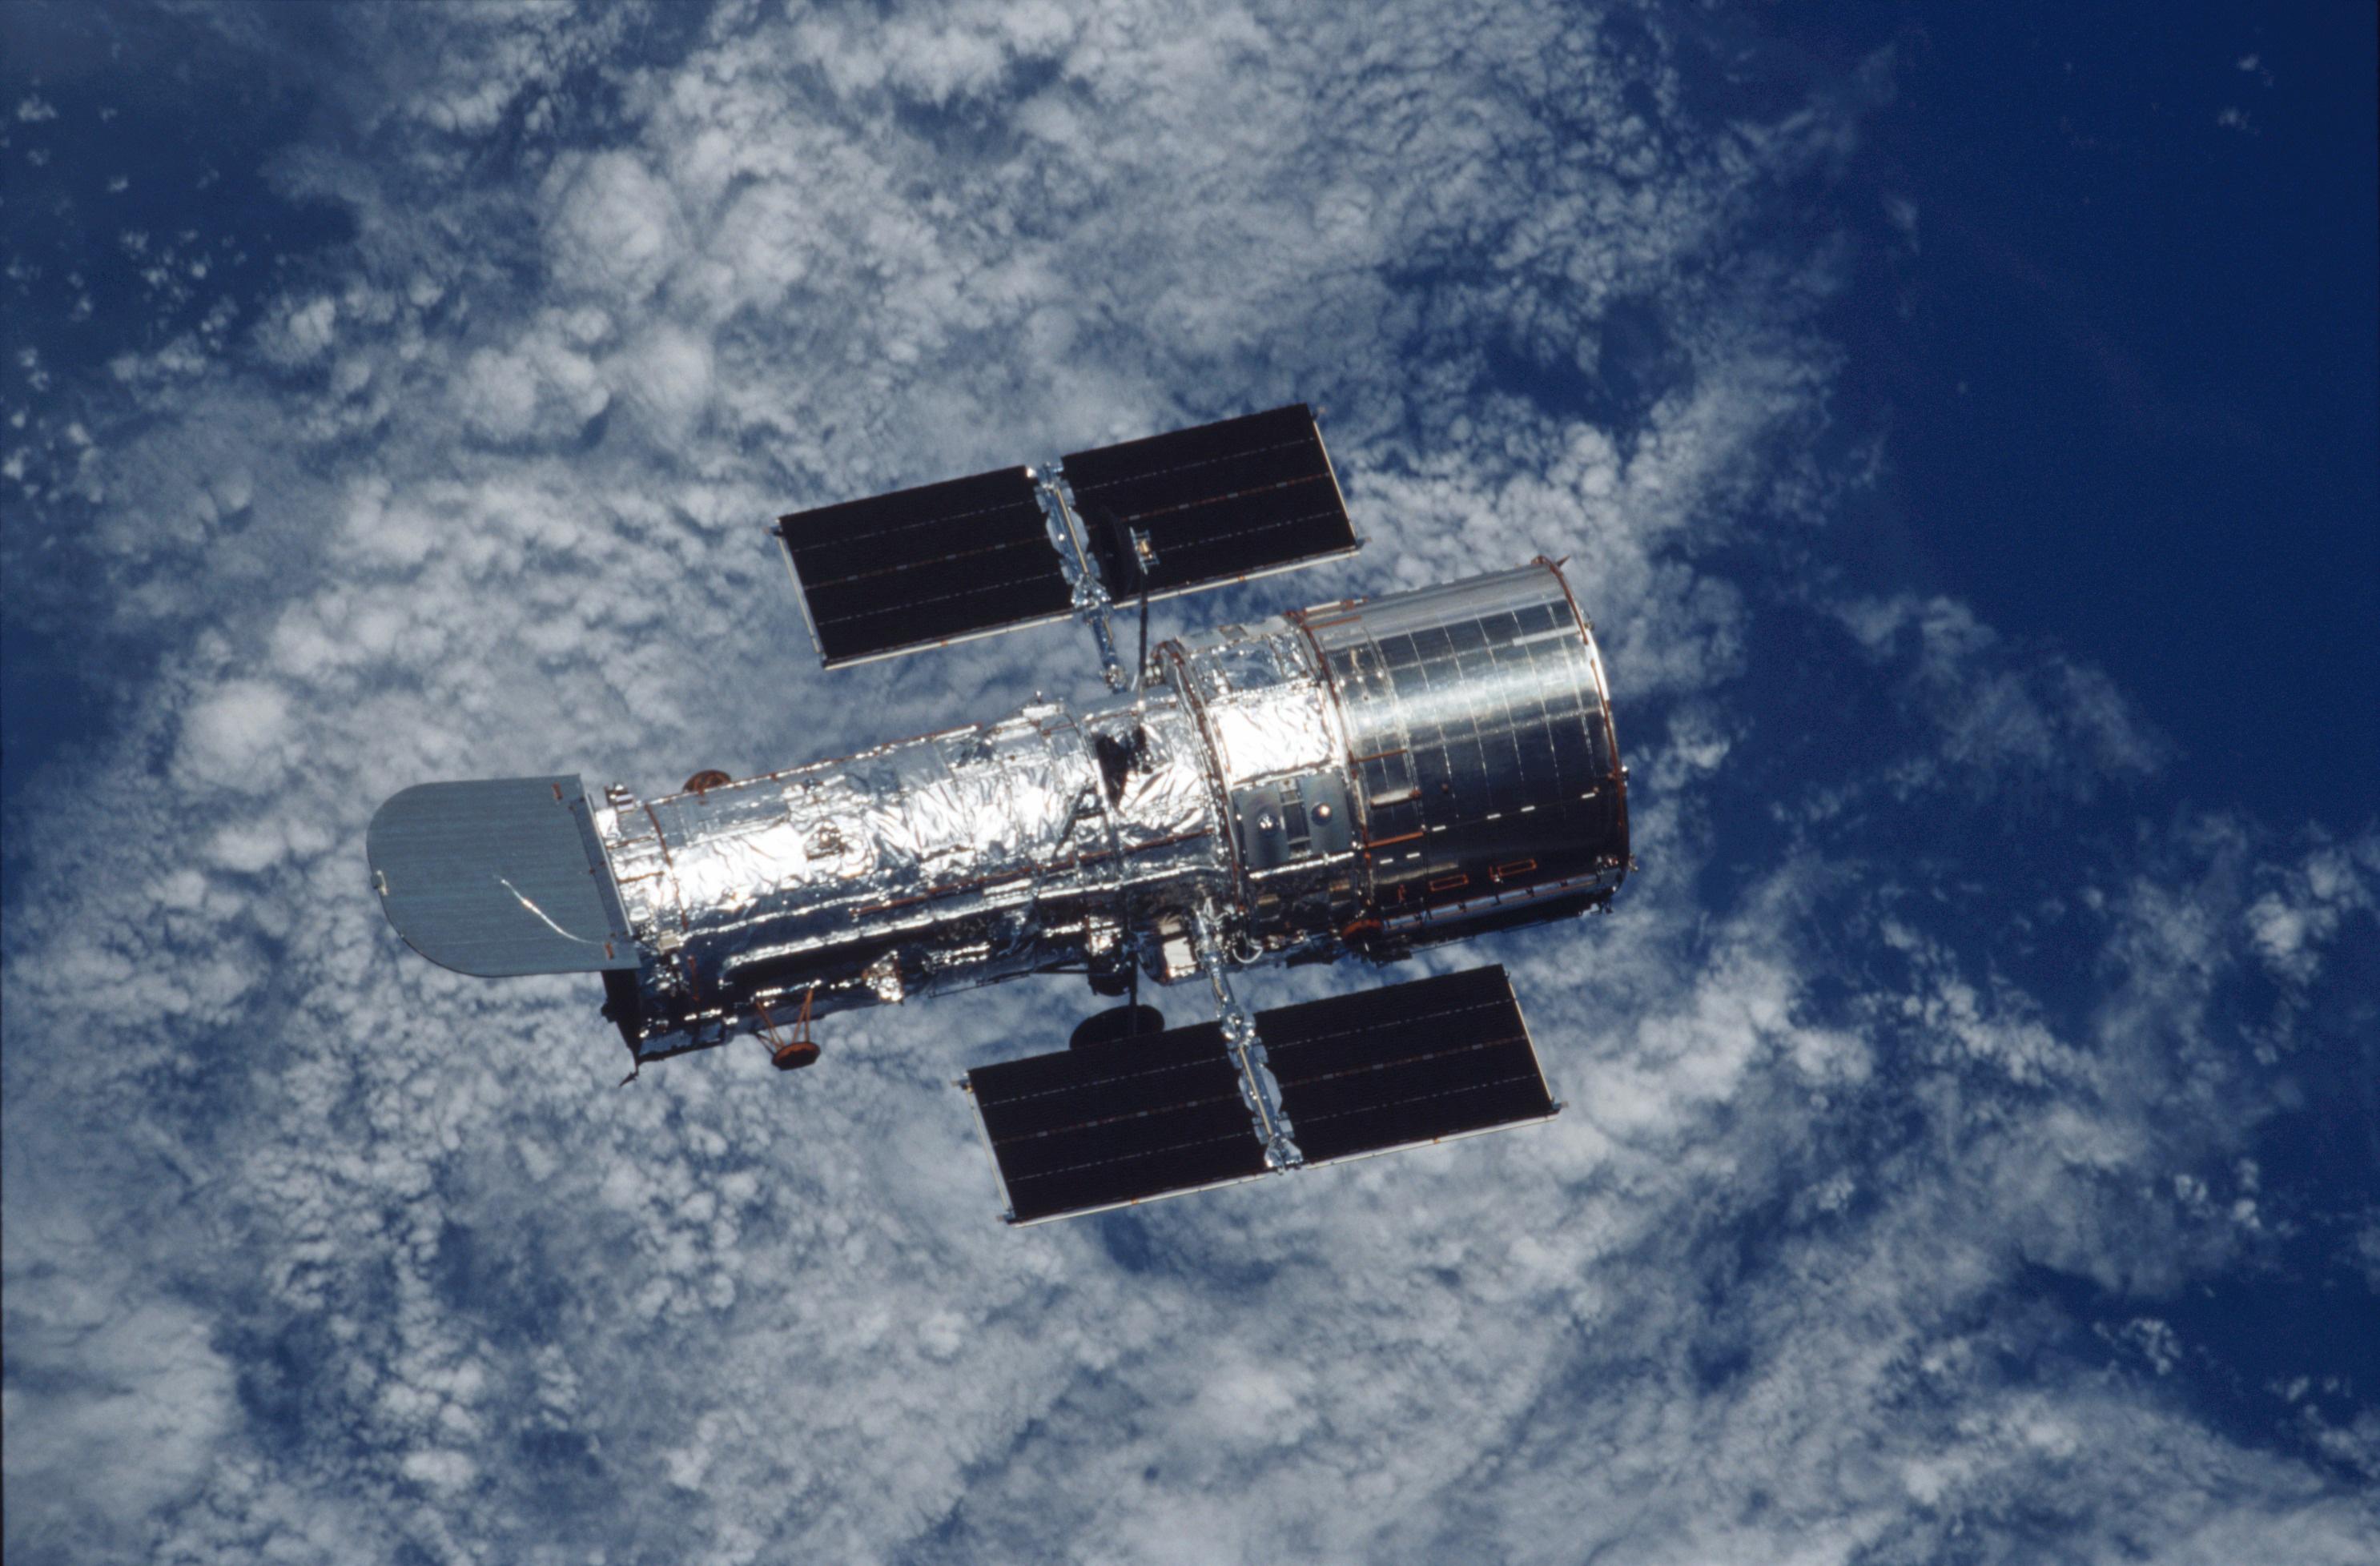 Hubble Space Telescope over Earth | ESA/Hubble